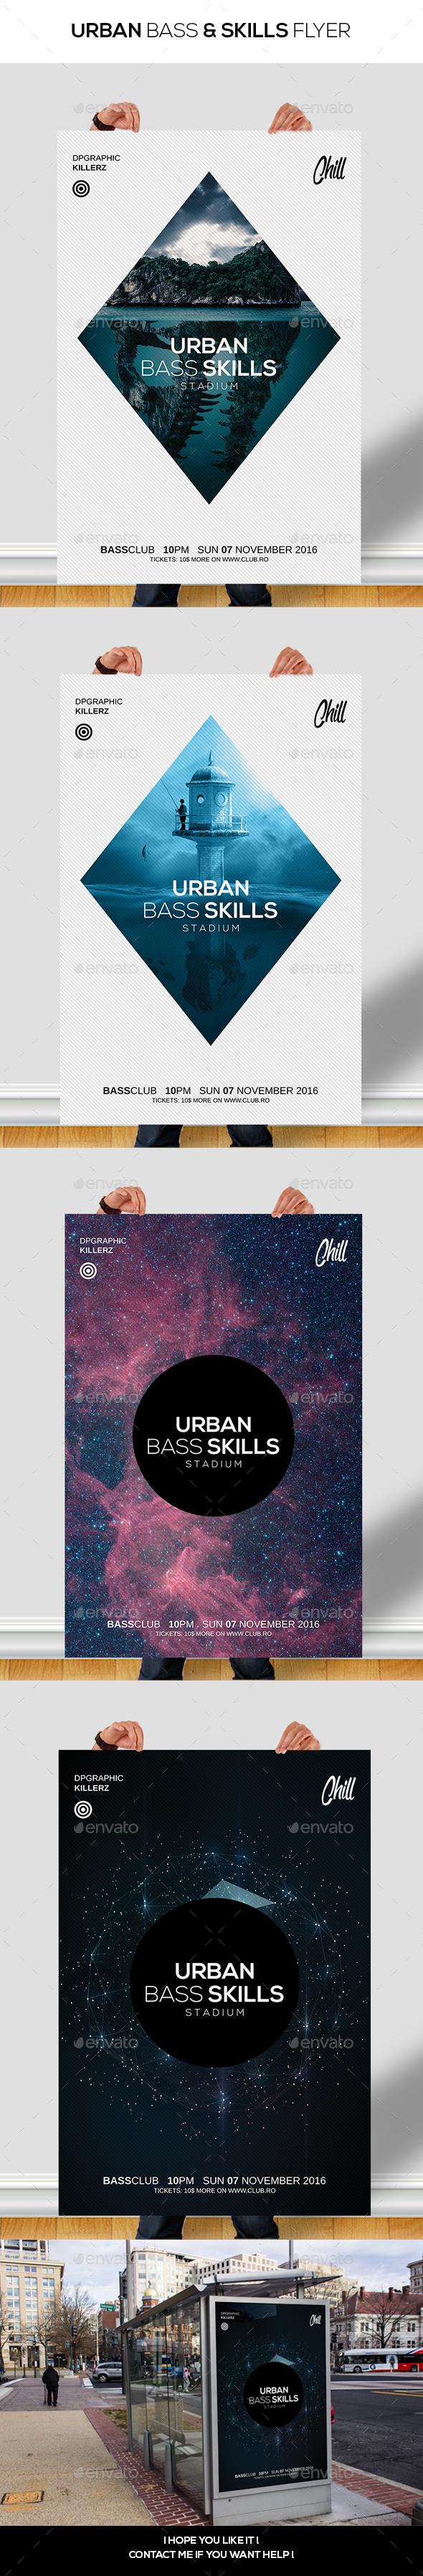 Urban Bass & Skills Flyer / Poster